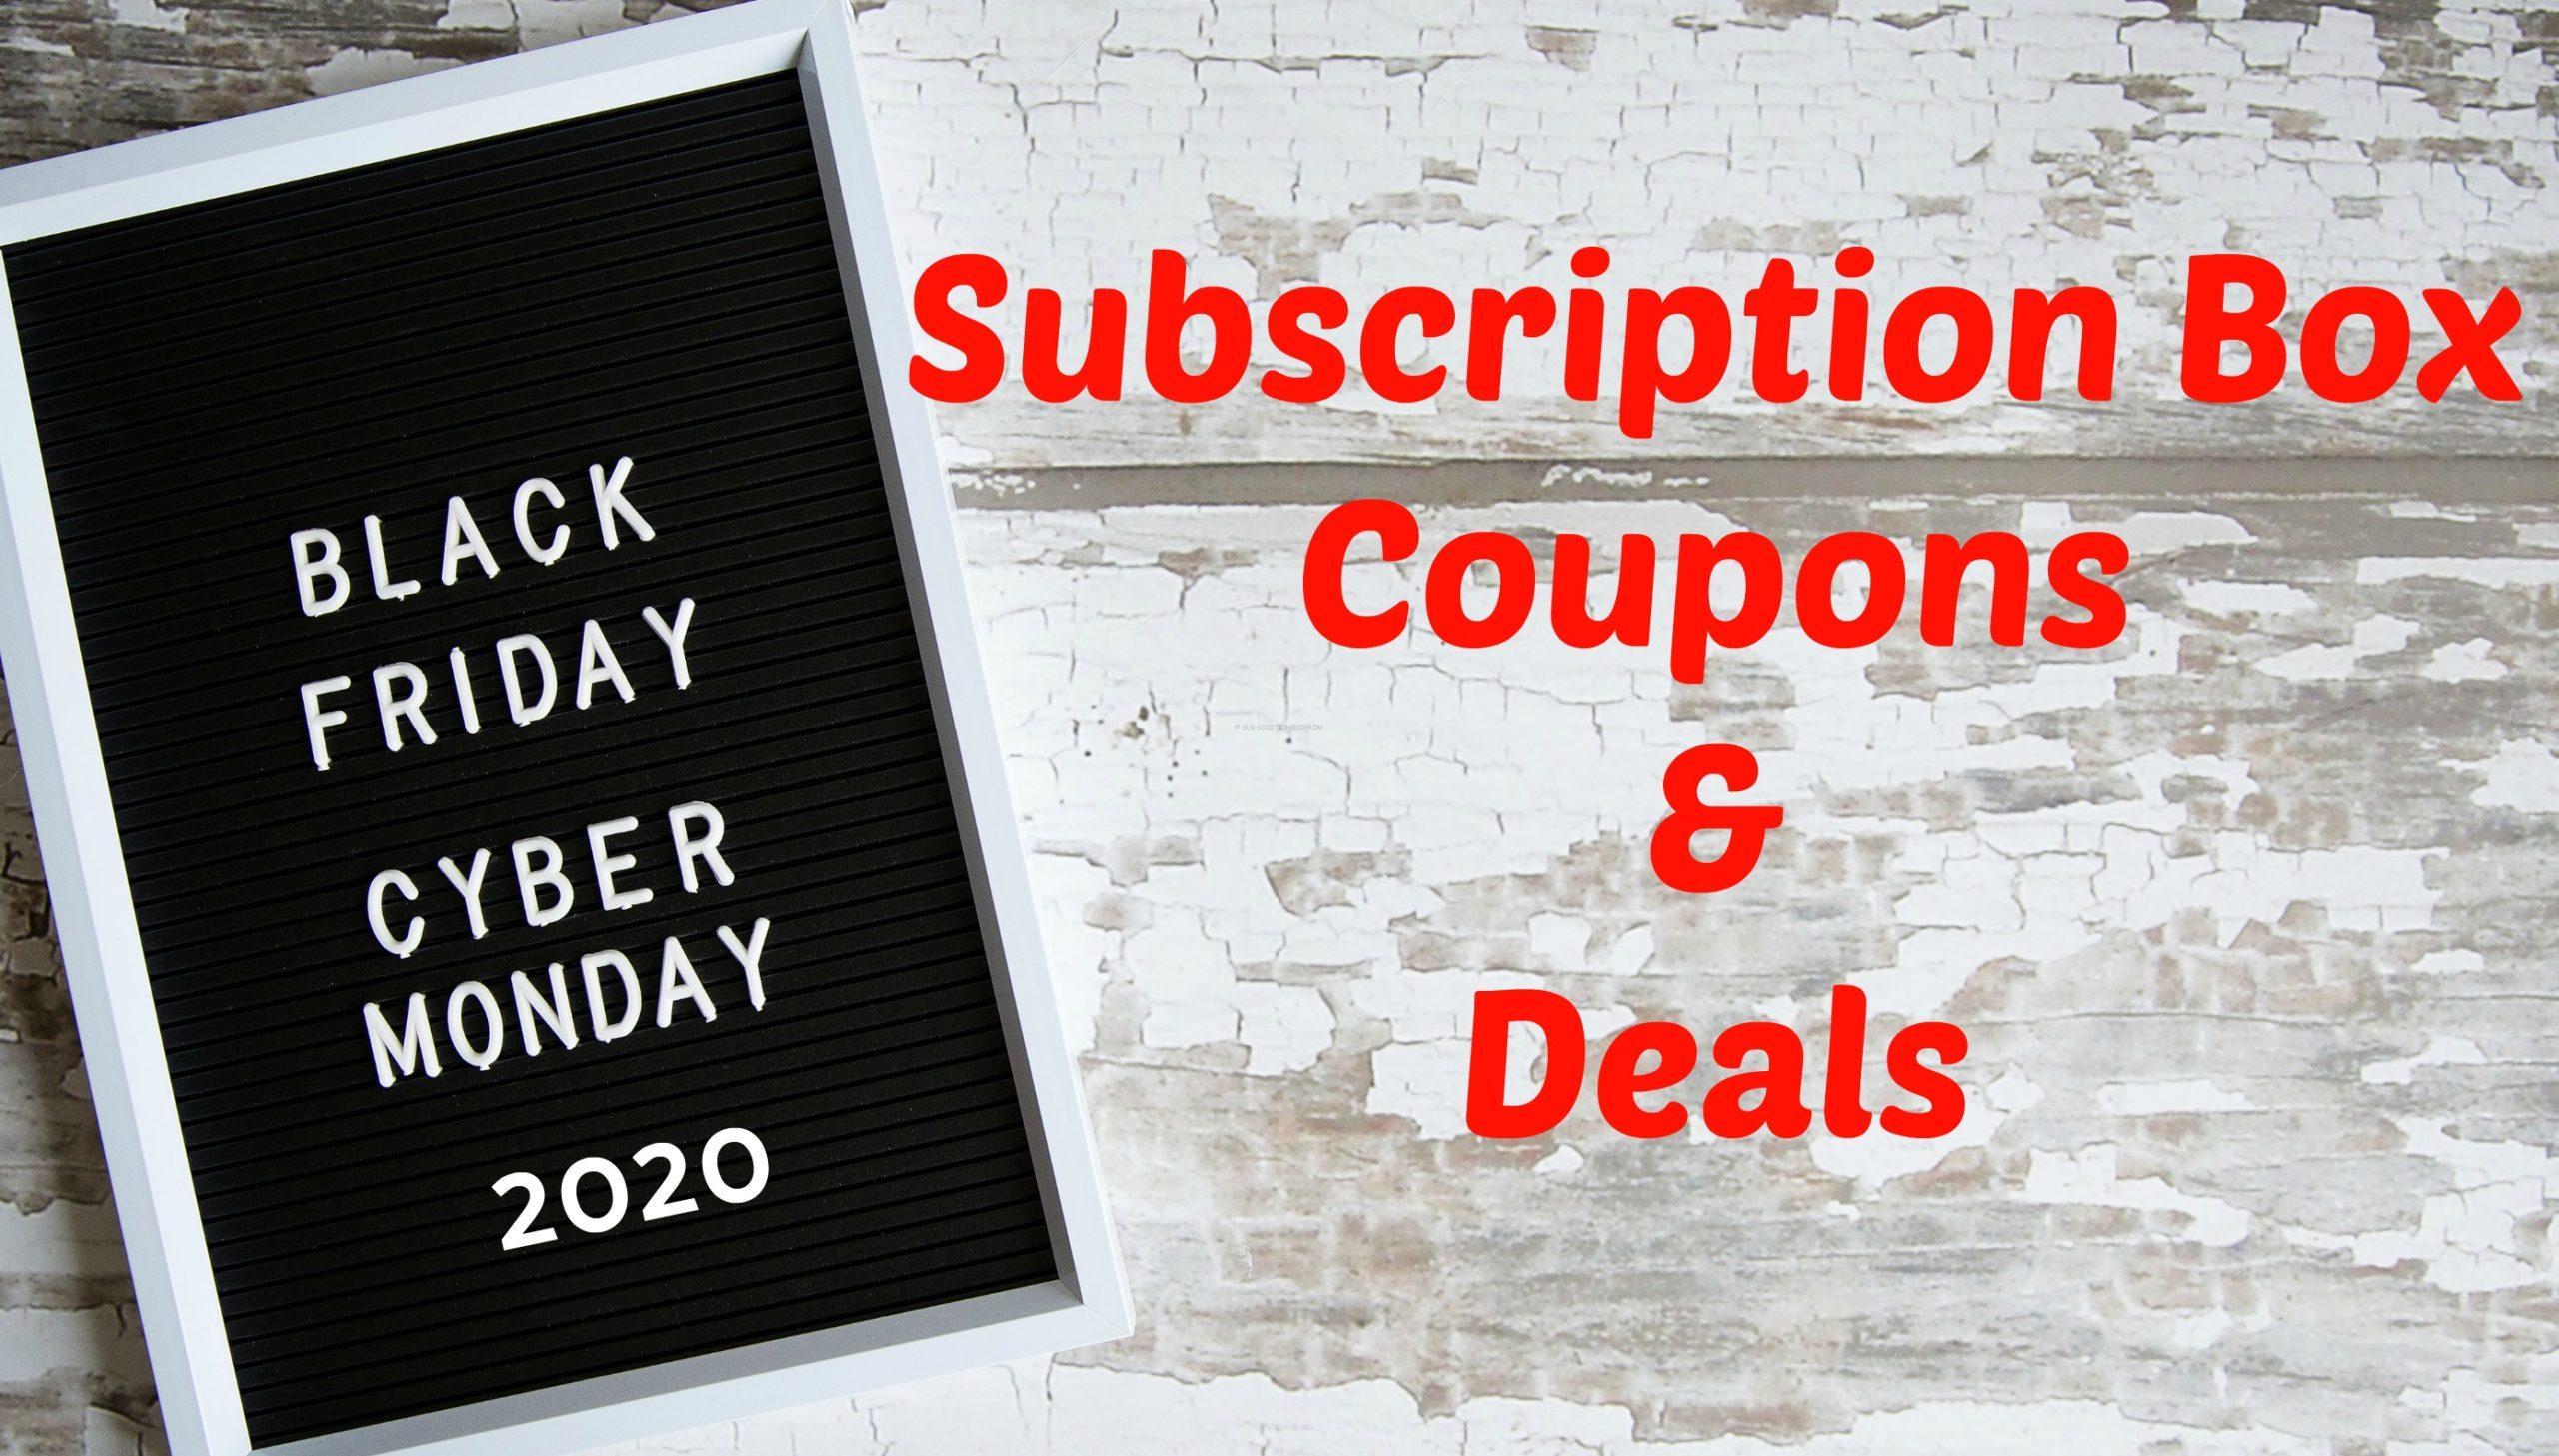 Black Friday 2020 Subscription Box Coupons